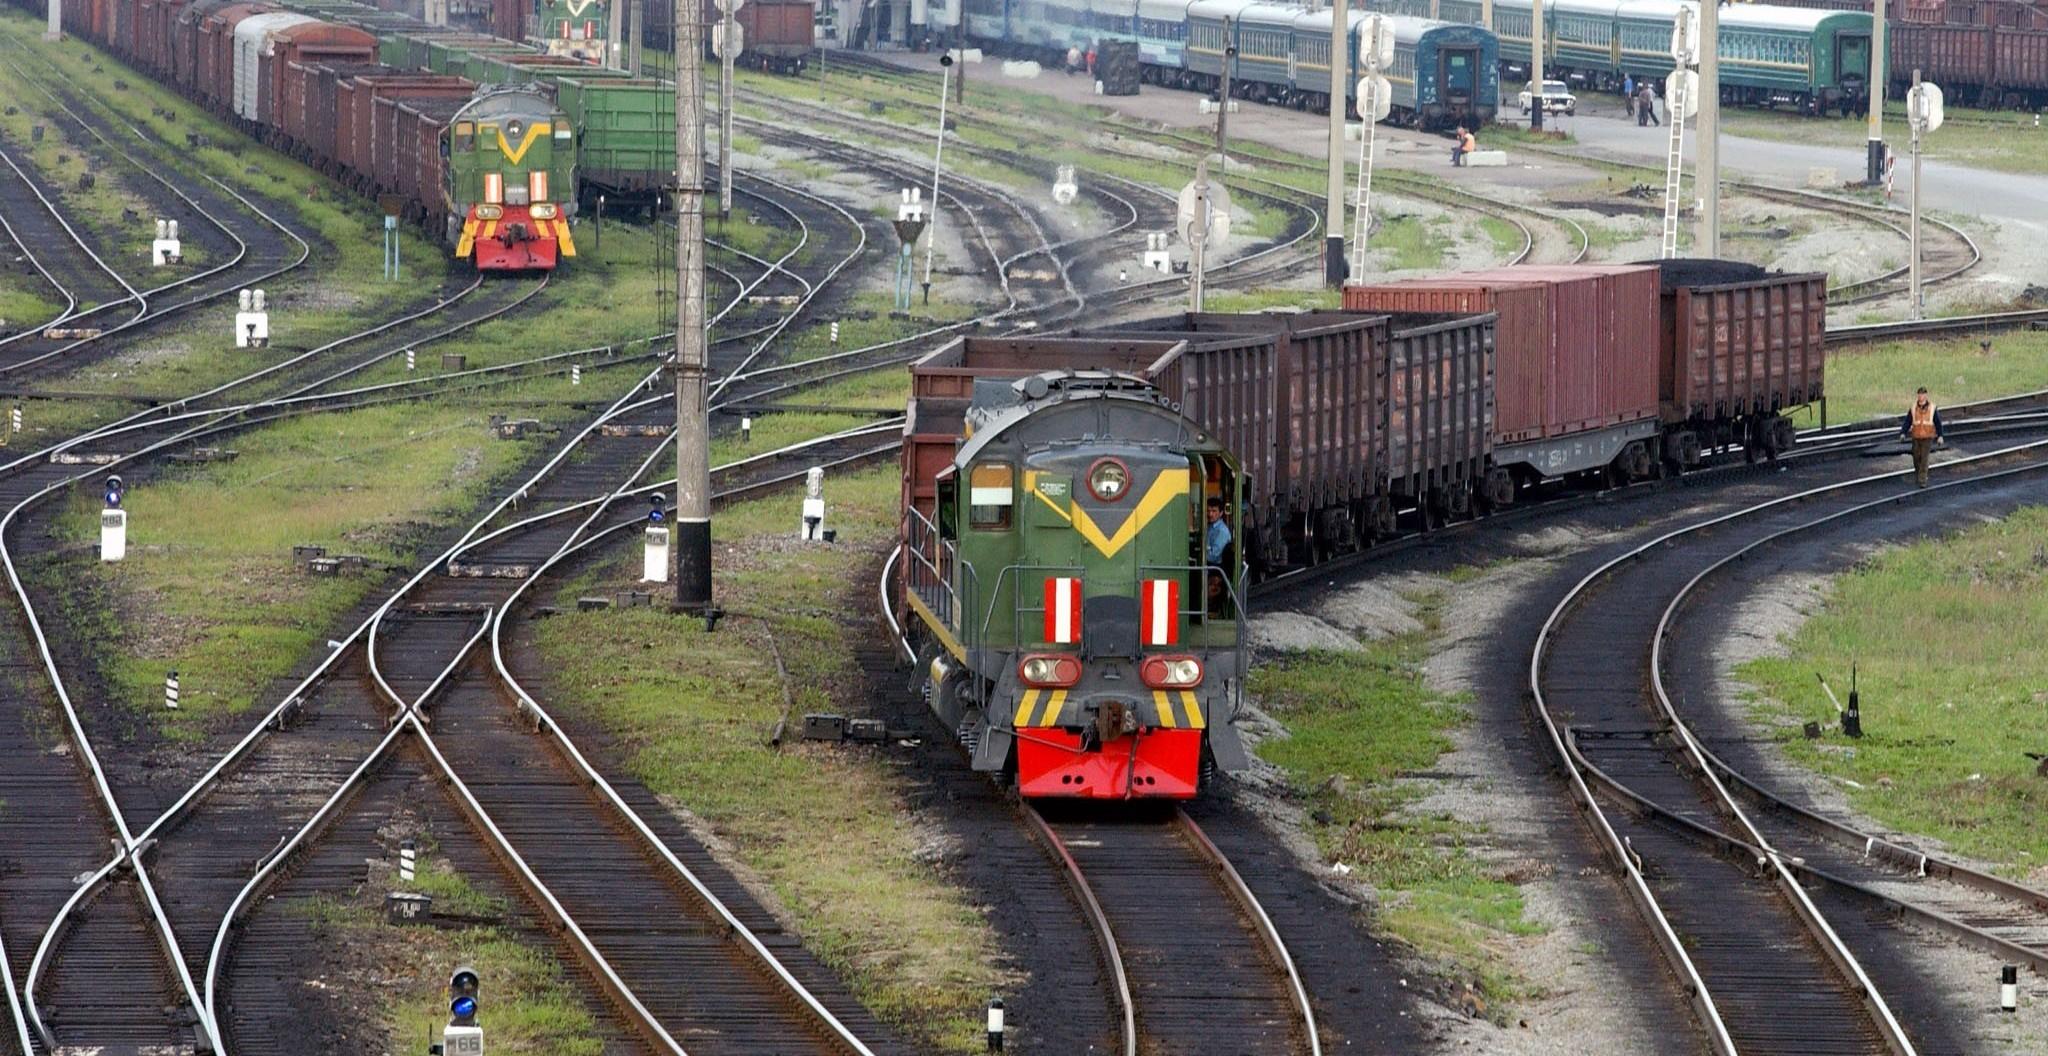 Медведев назначил ассистента Дворковича заместителем министра транспорта